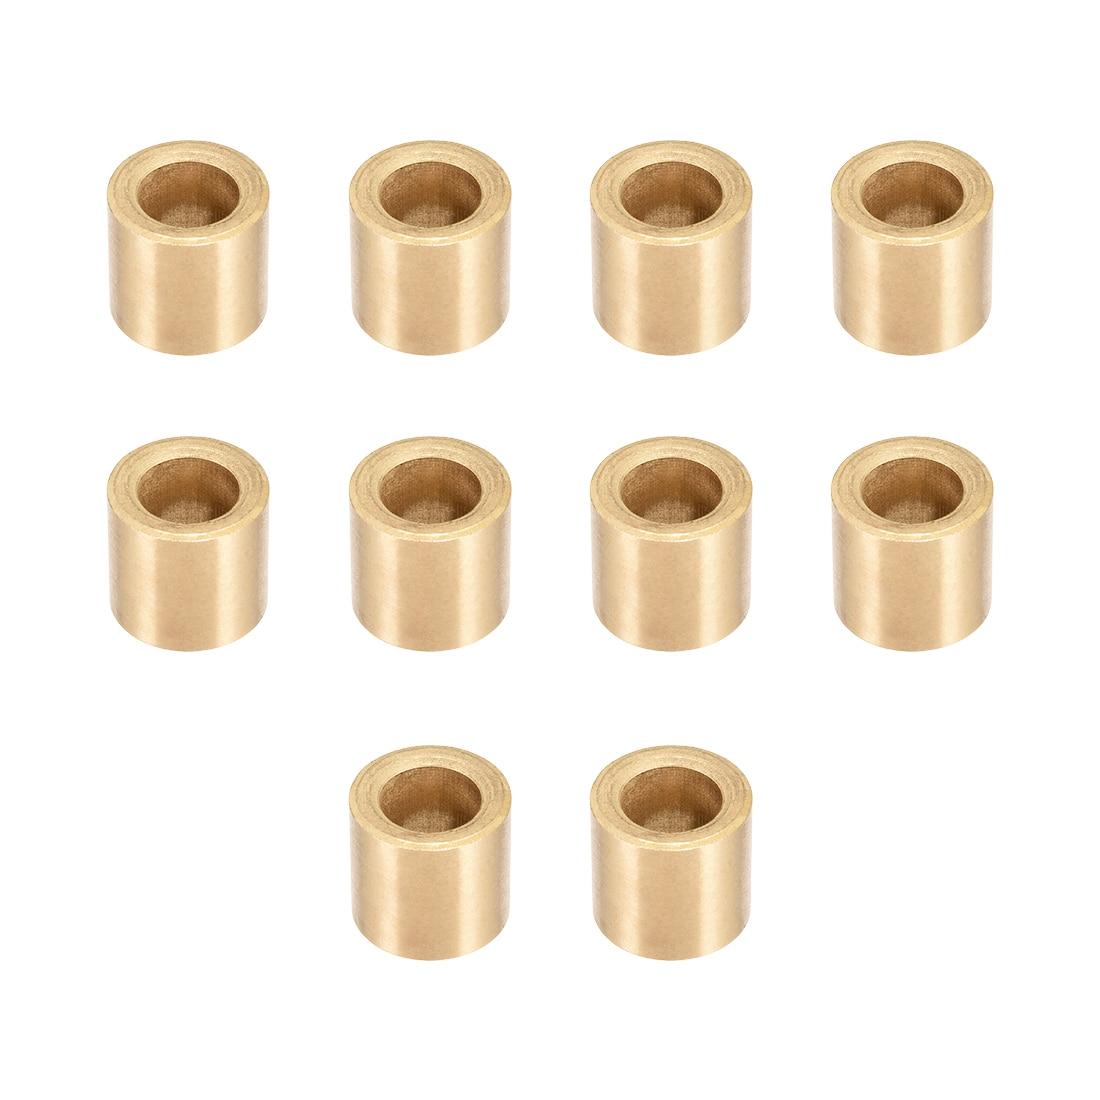 uxcell Sleeve Bearings 4mm Bore X 6mm OD X 8mm Length Plain Wrapped Oil-Less Bushings 10pcs